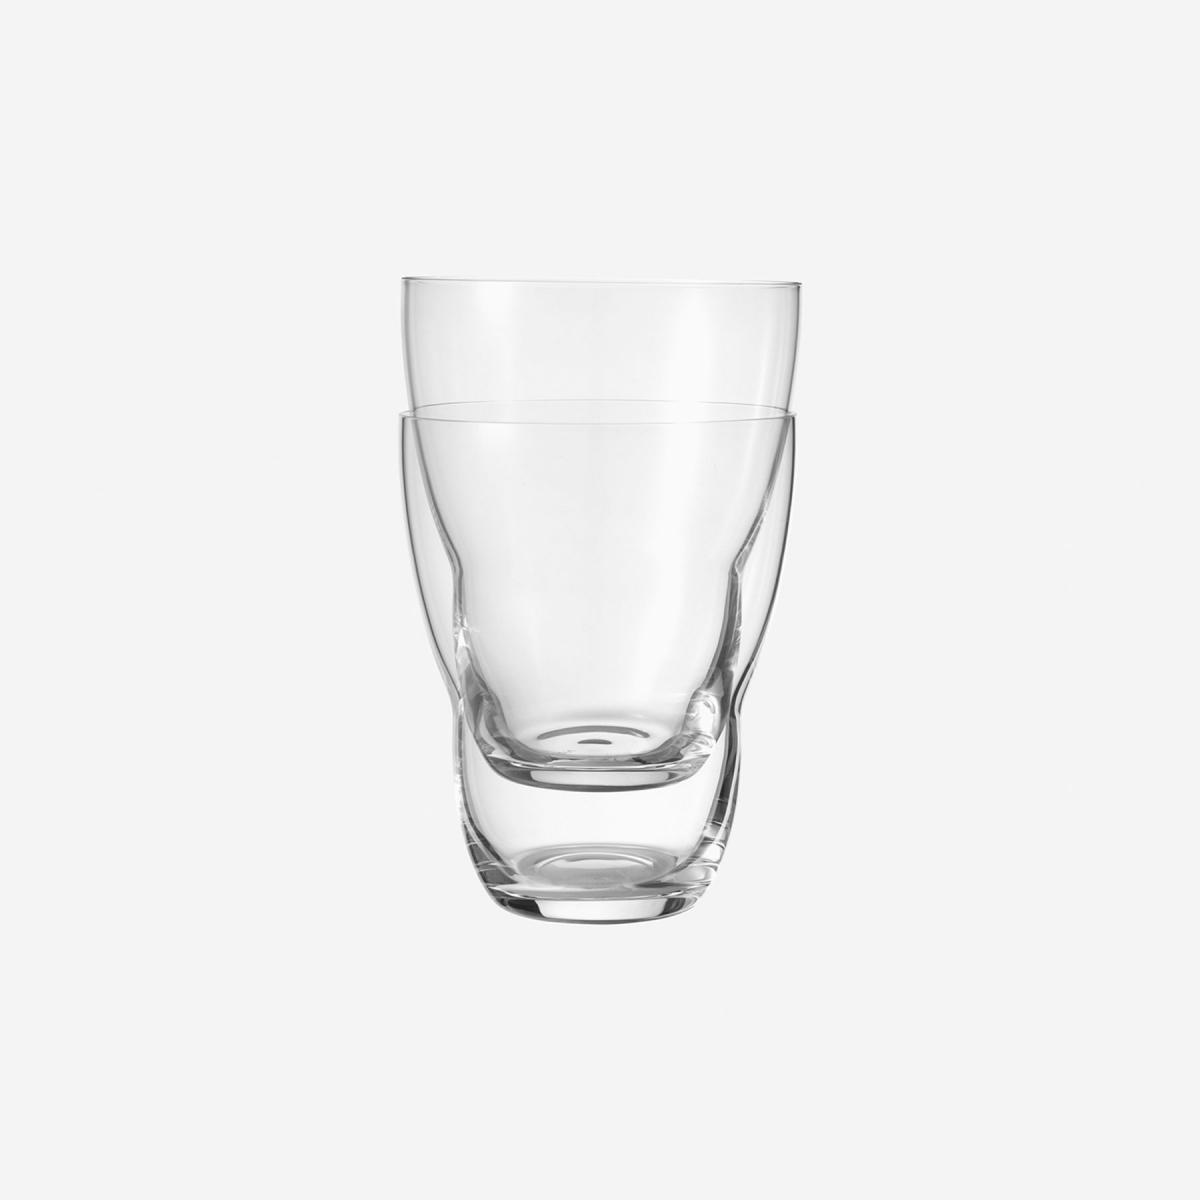 Vipp   Glas 33 cl - 2 stk. - Bolighuset Werenberg